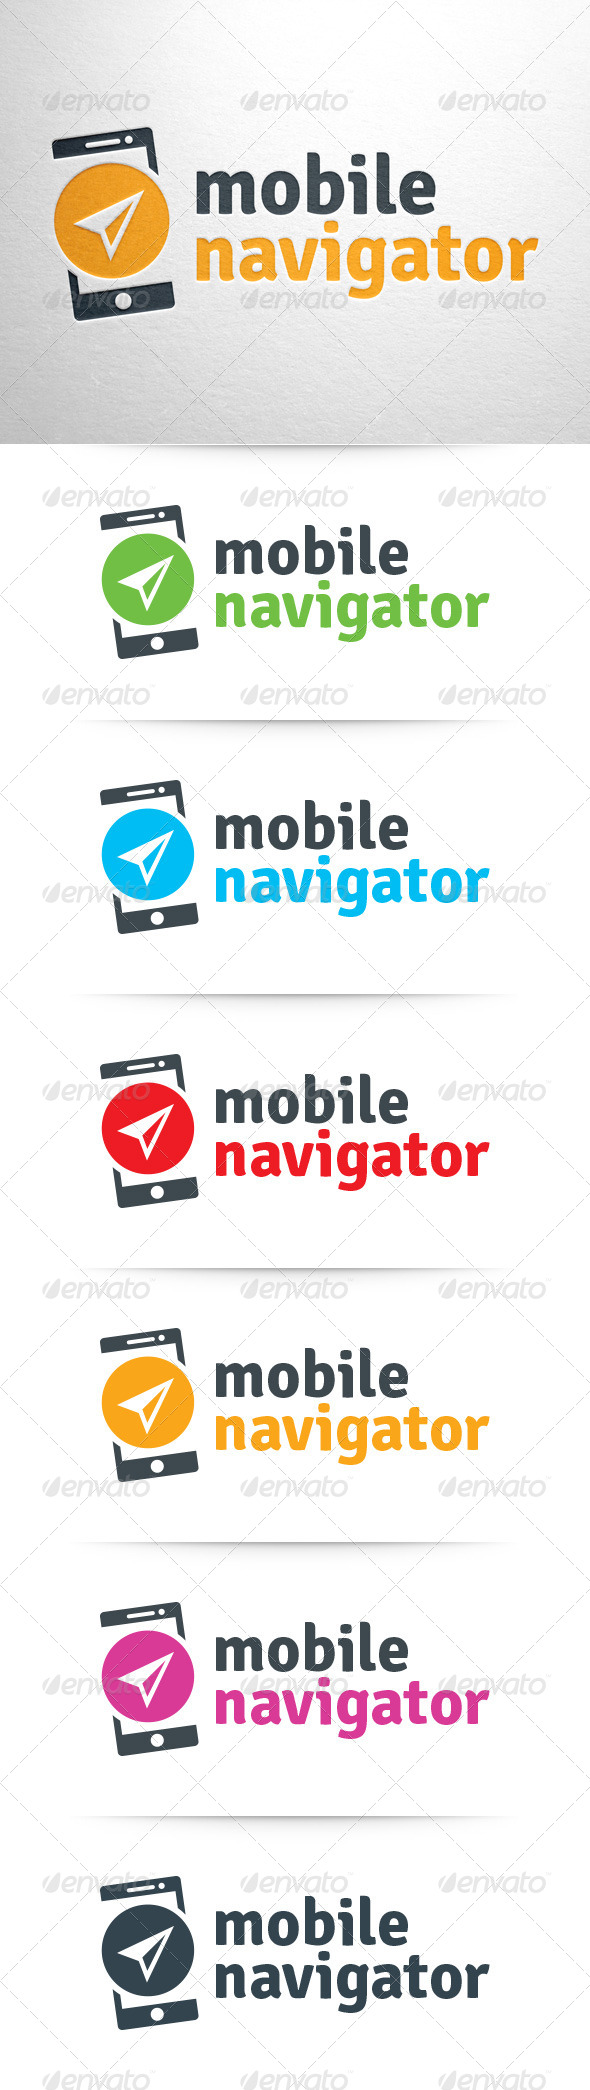 Mobile Navigator Logo Template